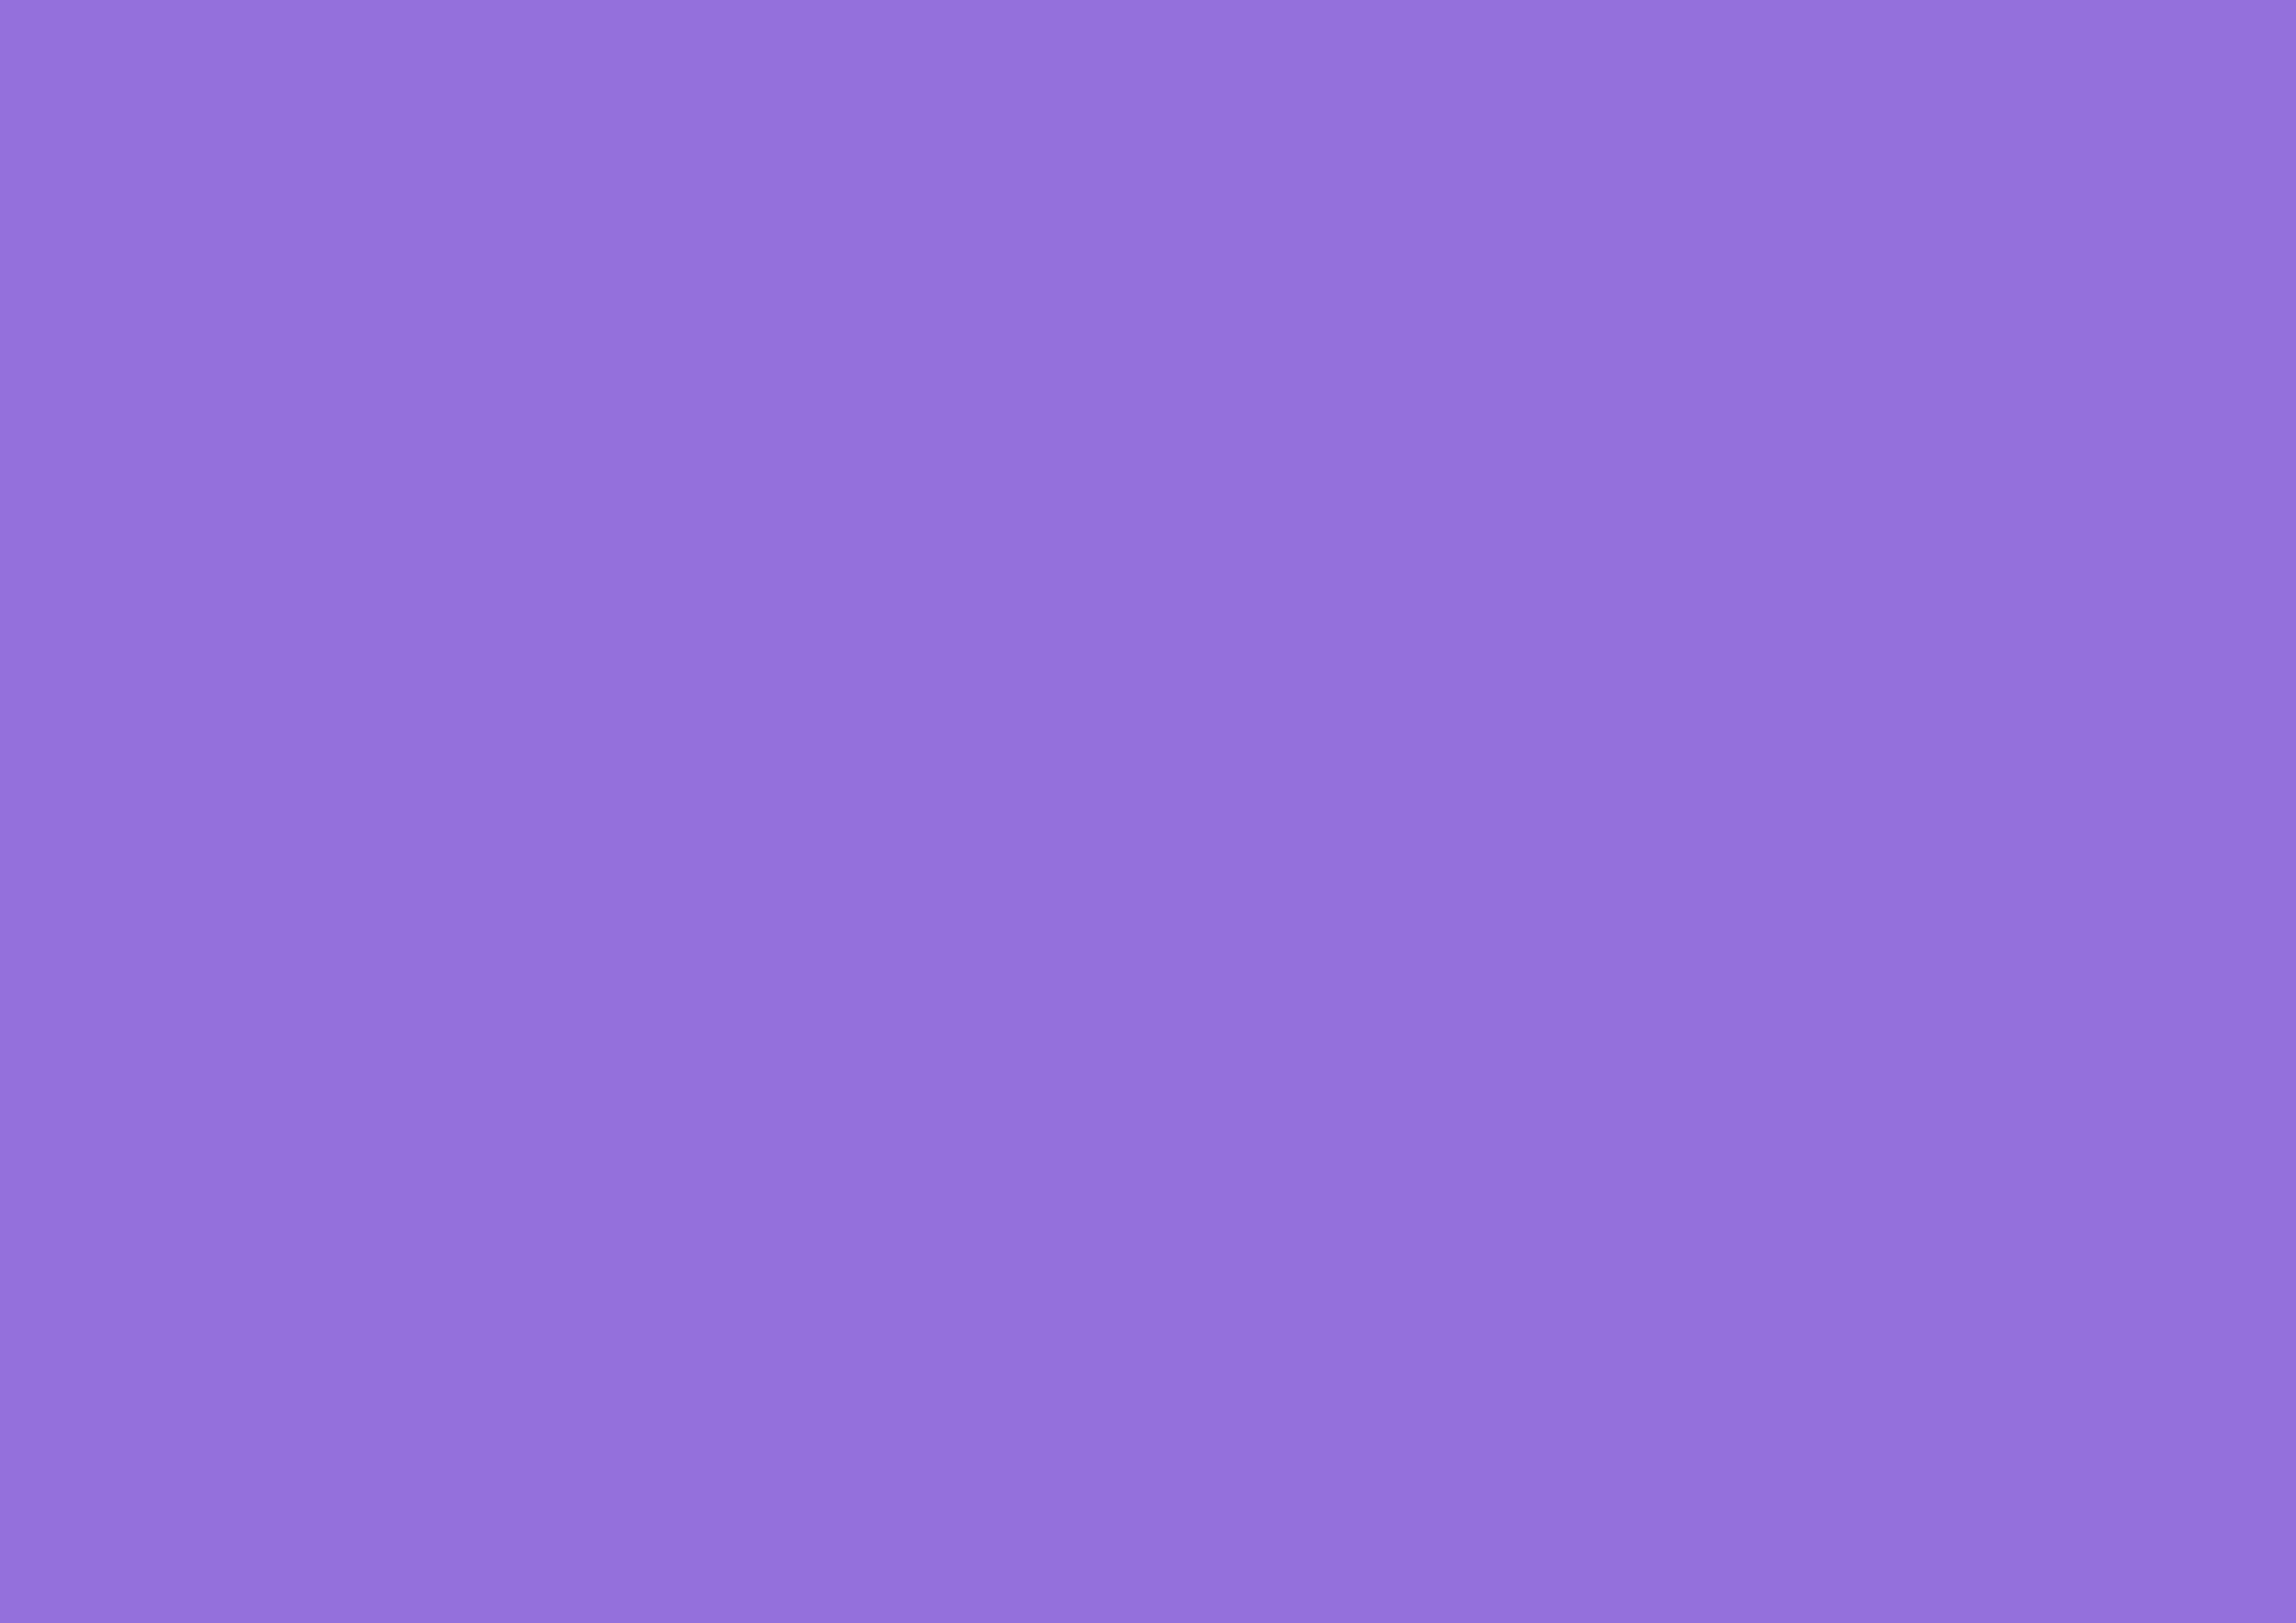 3508x2480 Medium Purple Solid Color Background